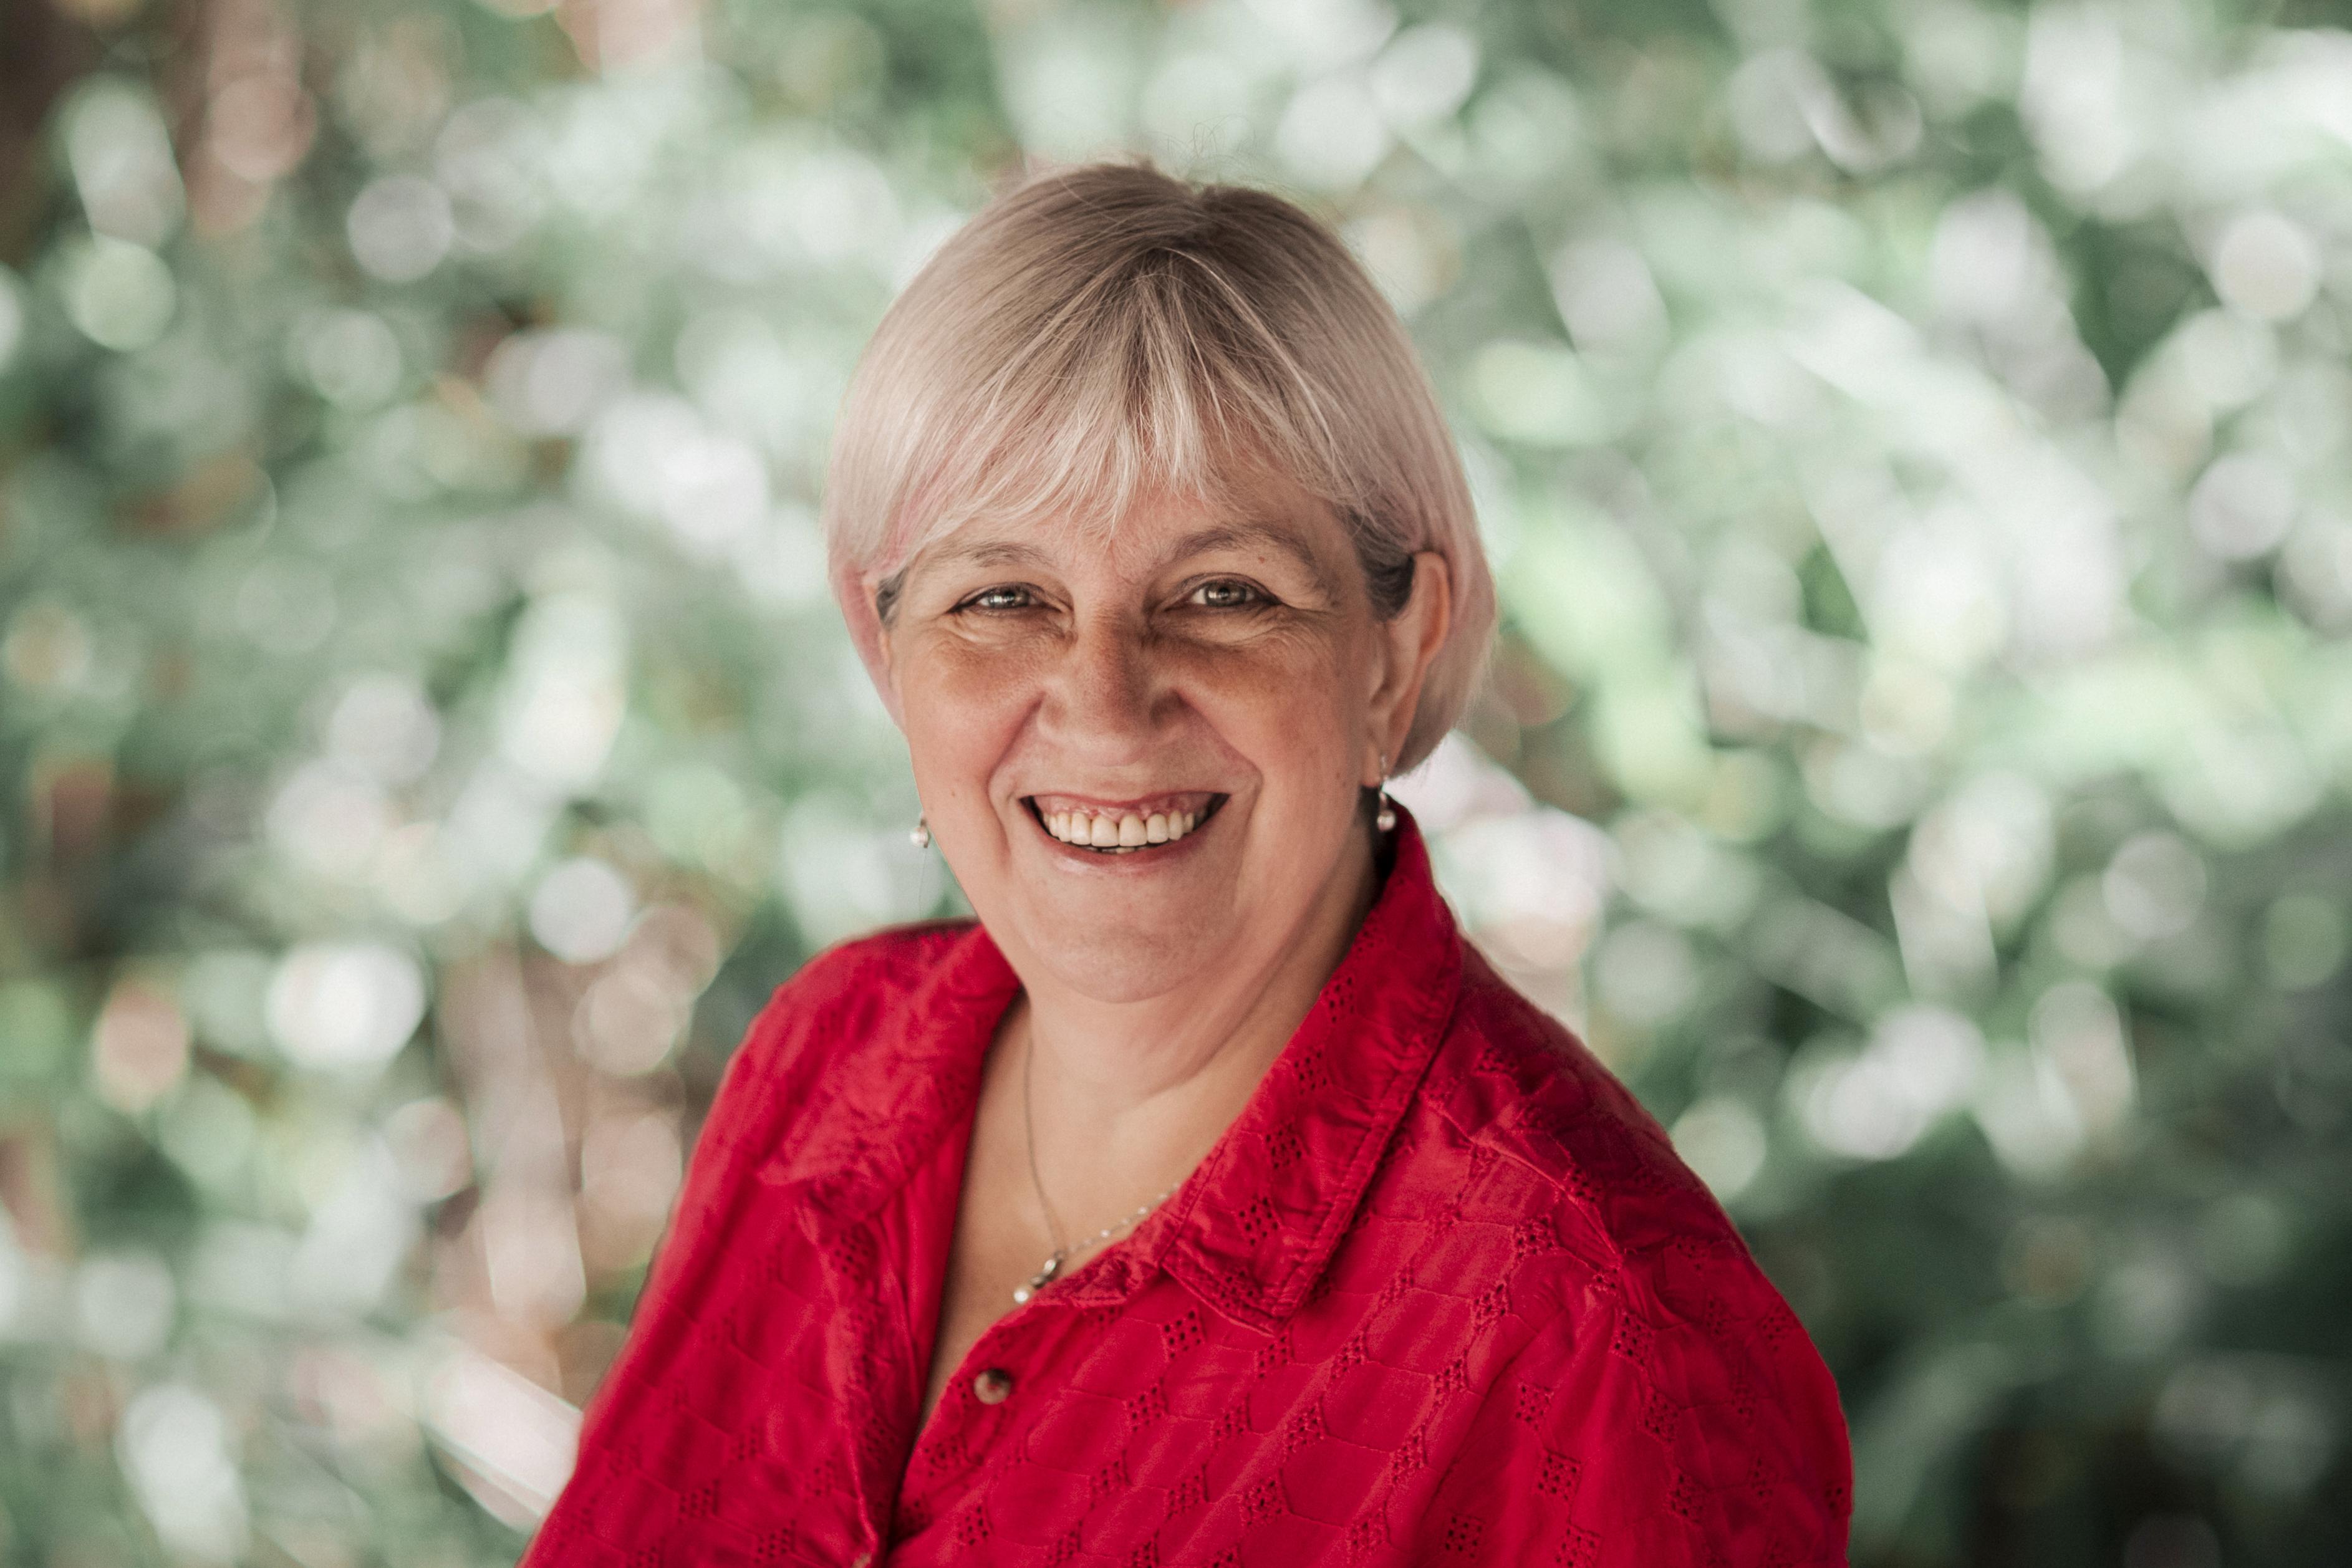 Mandy Whitburn